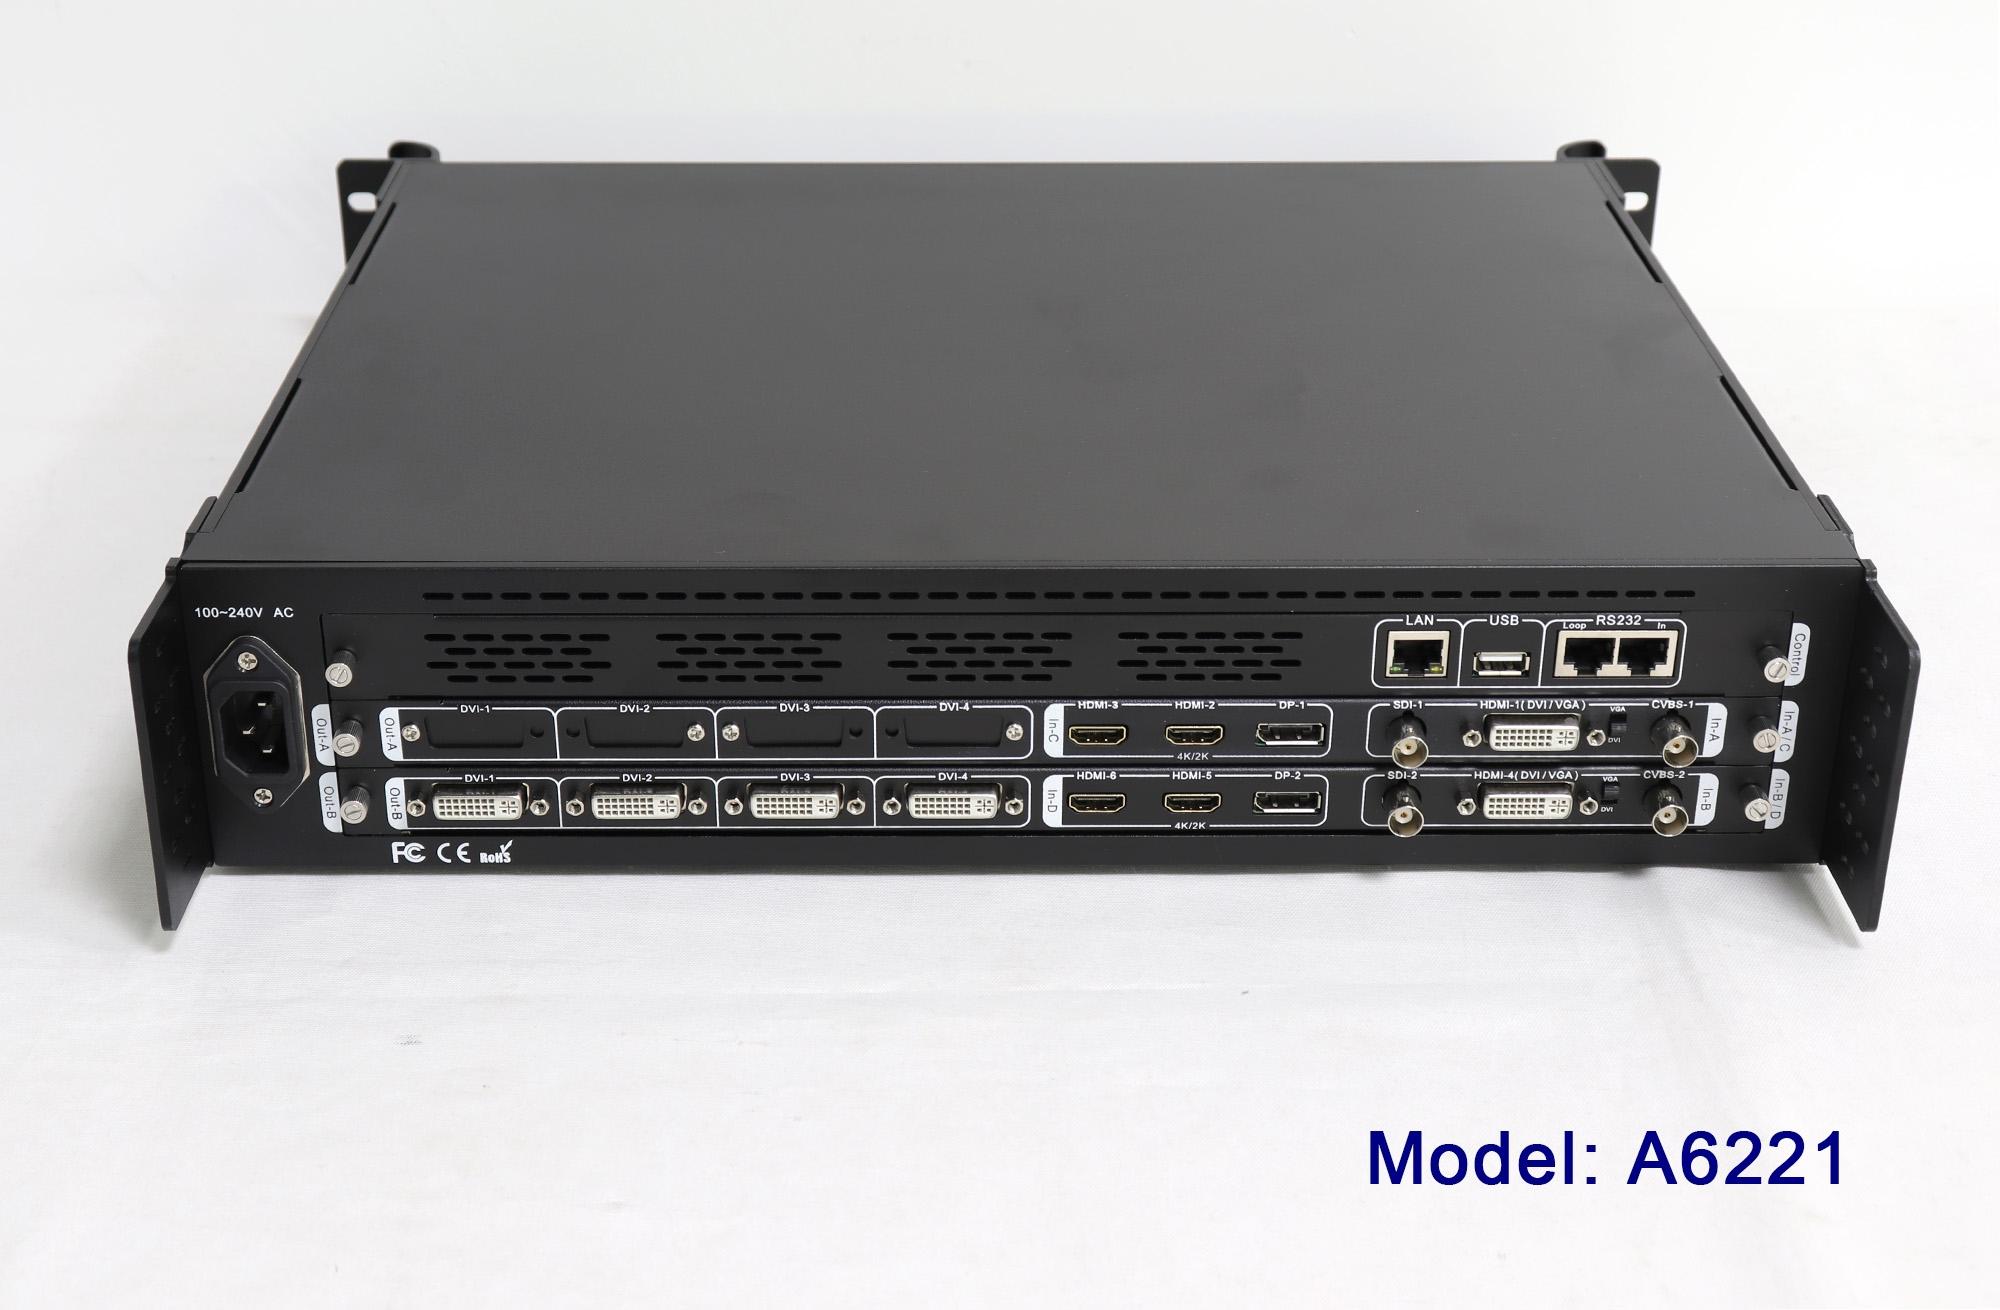 VDWall A6000 4K HD Multi-window Video Processor